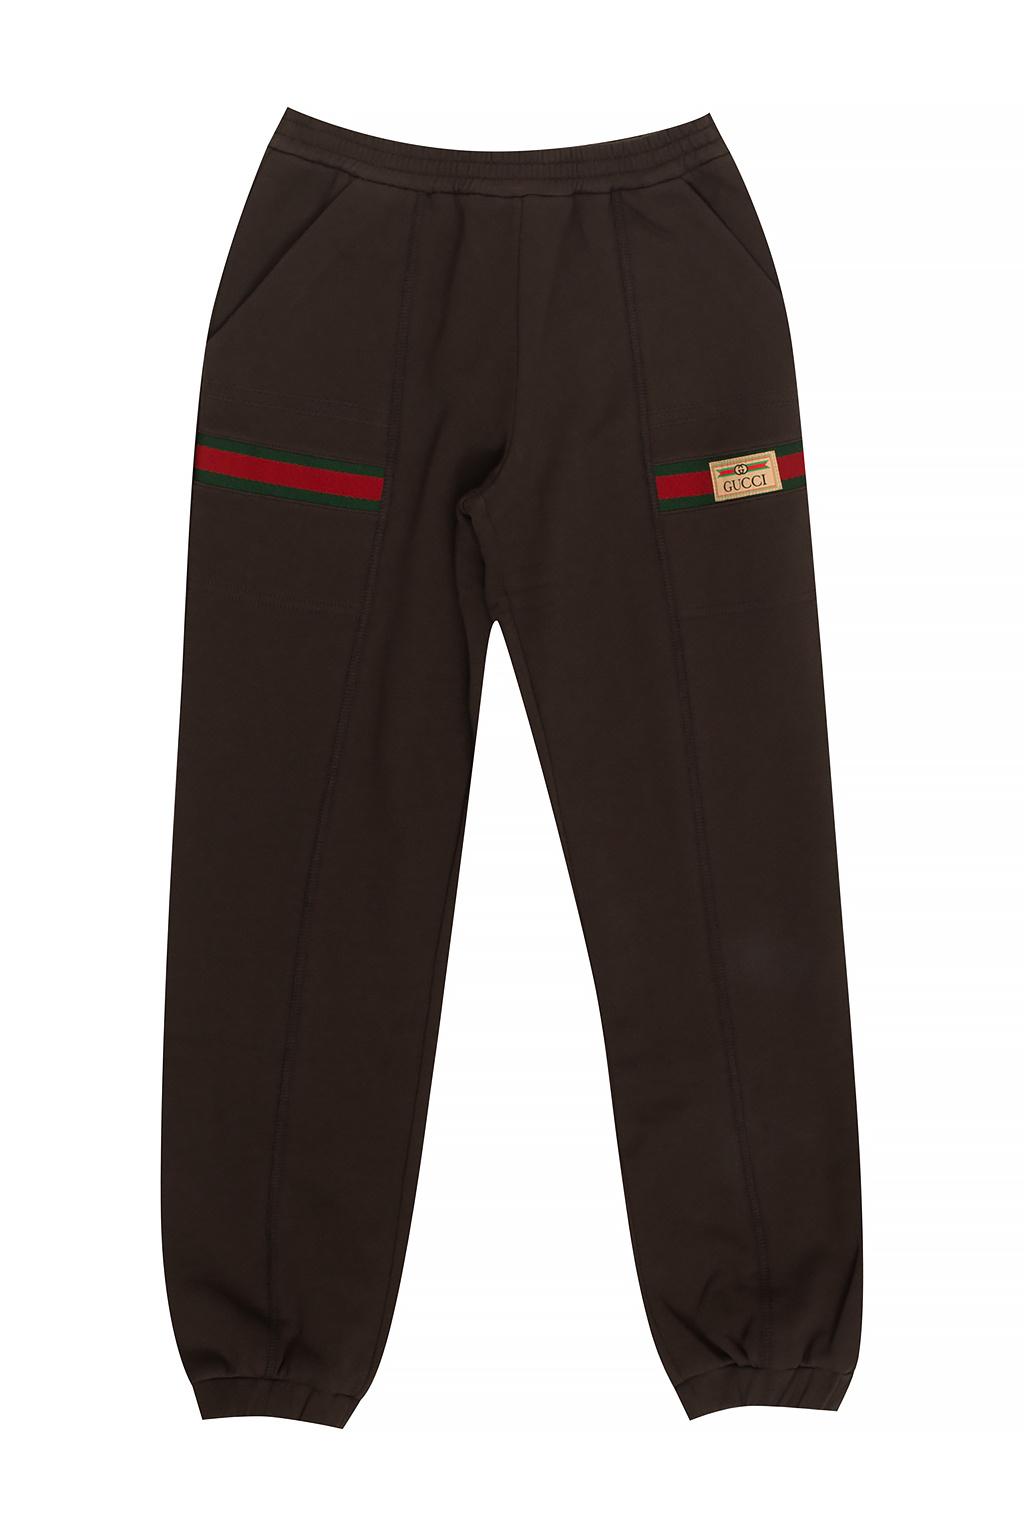 Gucci Kids Sweatpants with Web stripe